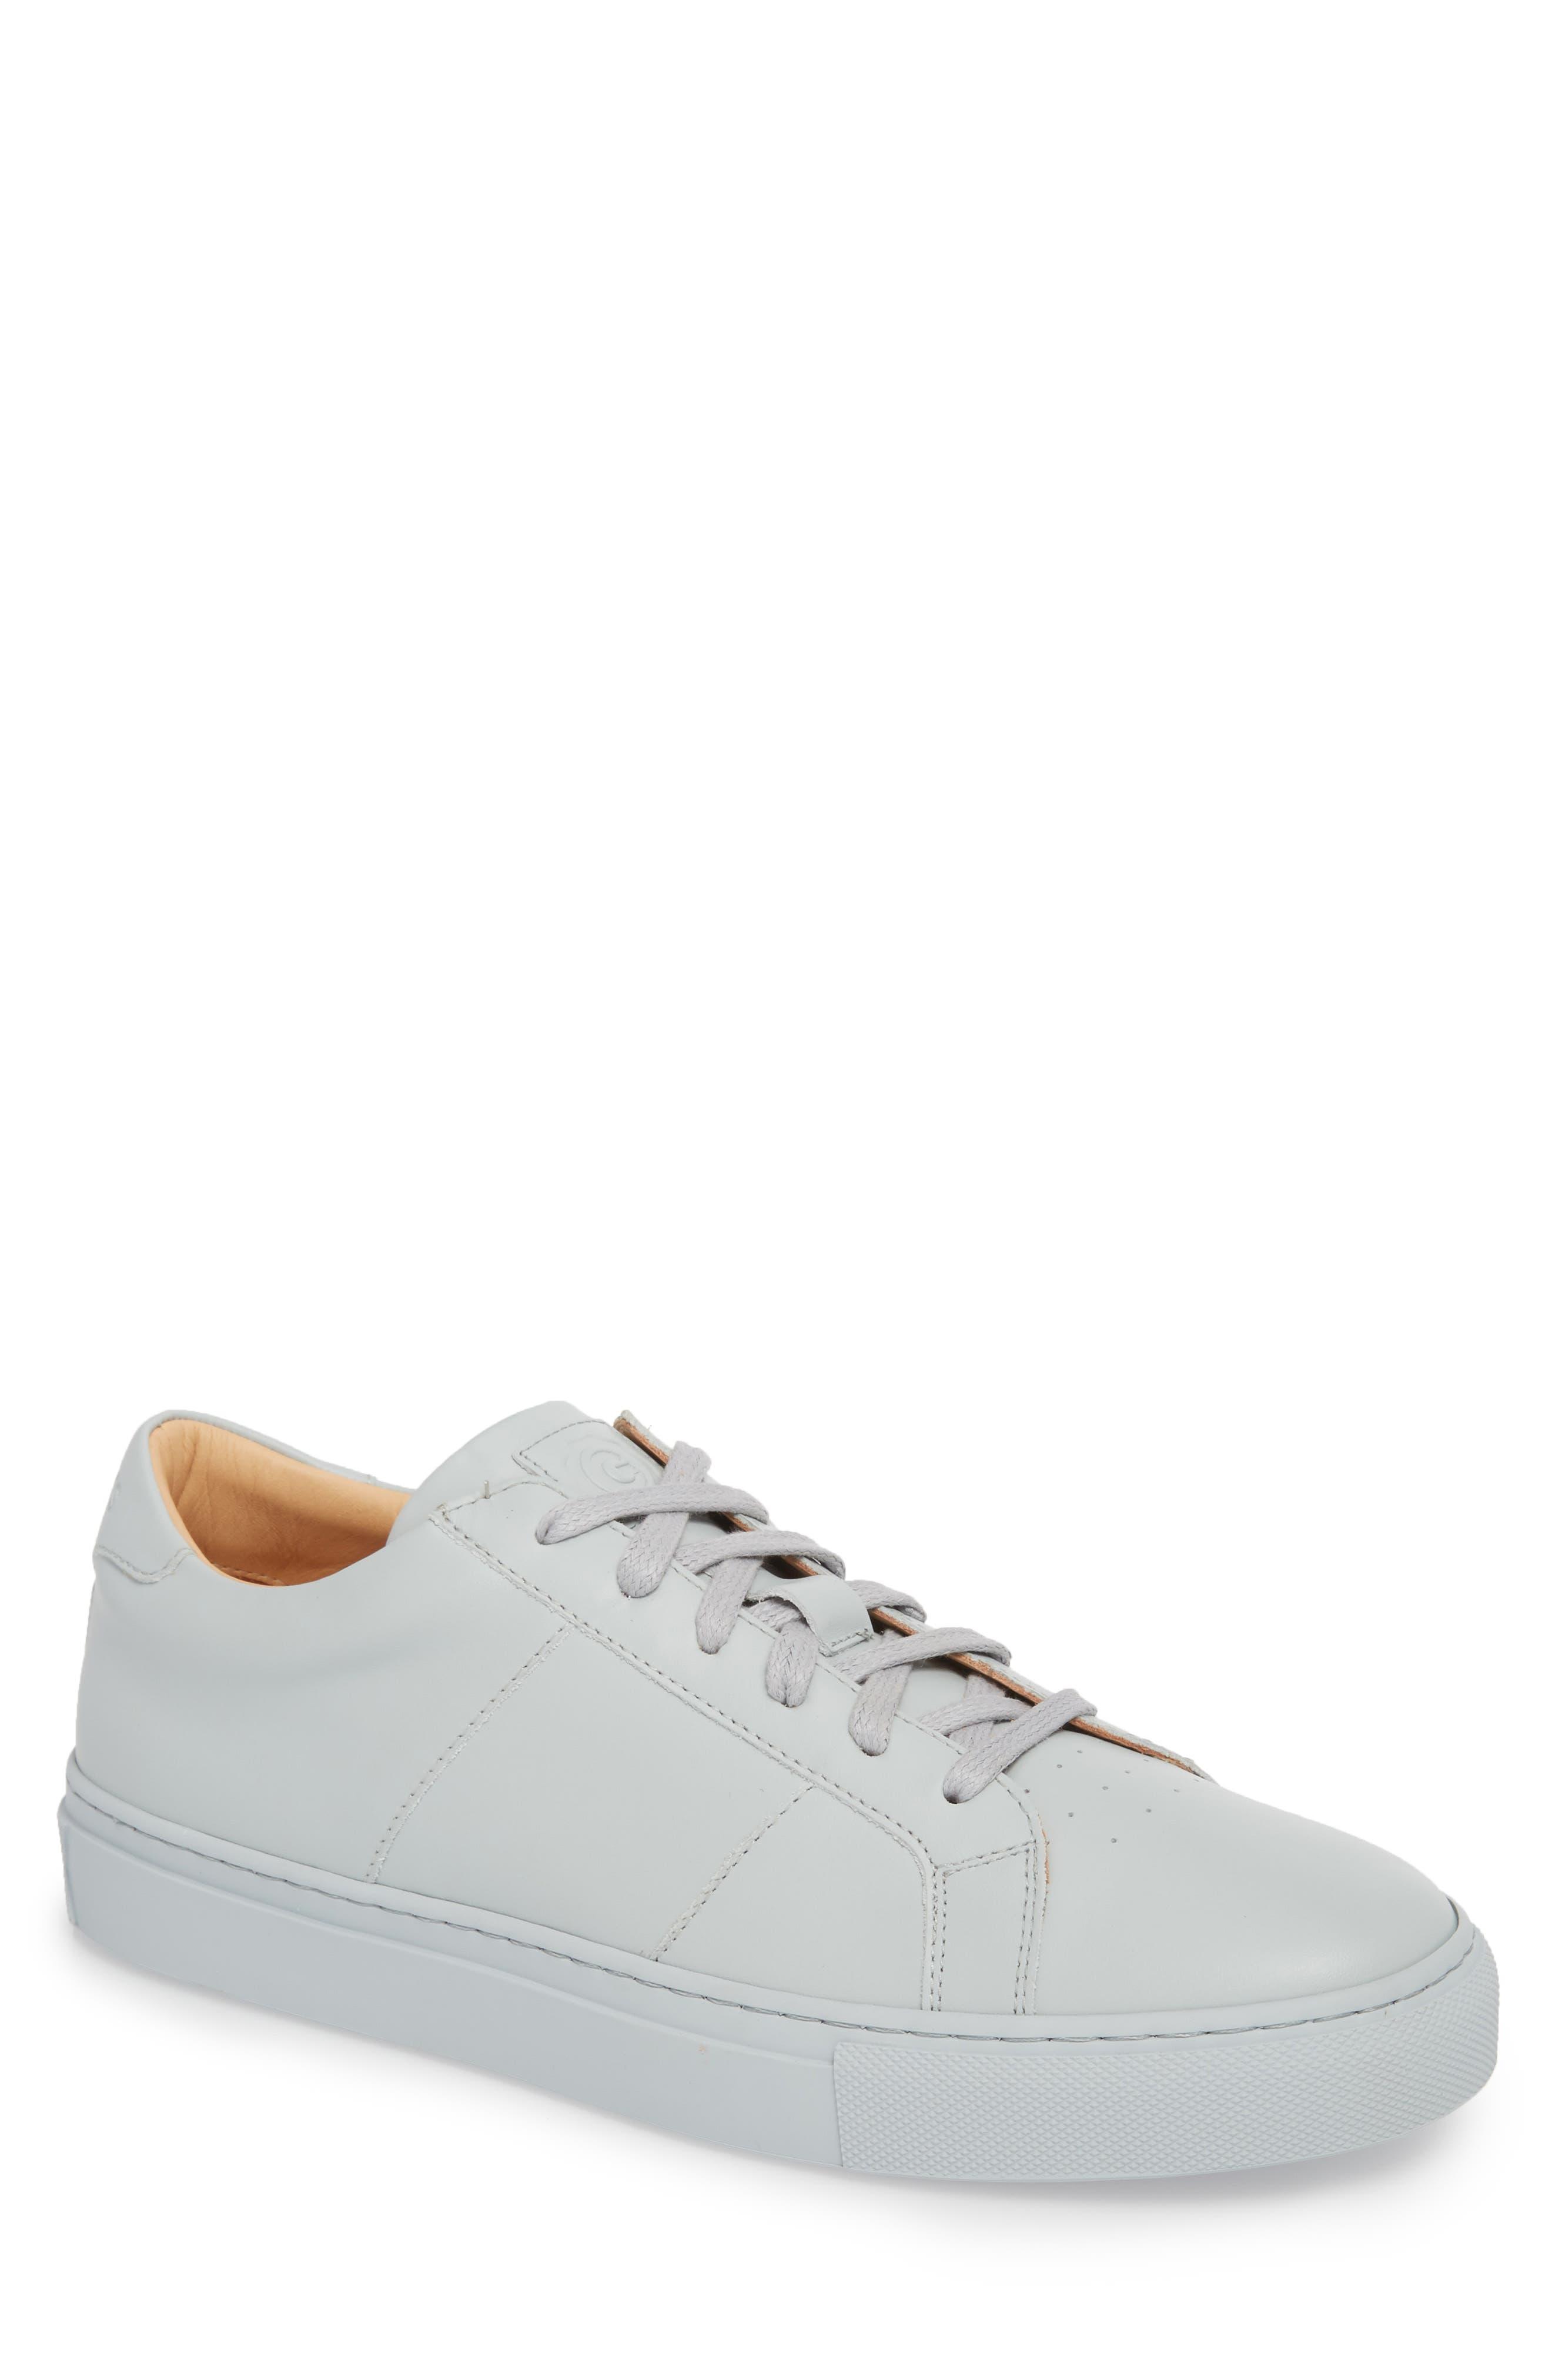 Royale Sneaker,                             Main thumbnail 1, color,                             Grey Tonal Leather